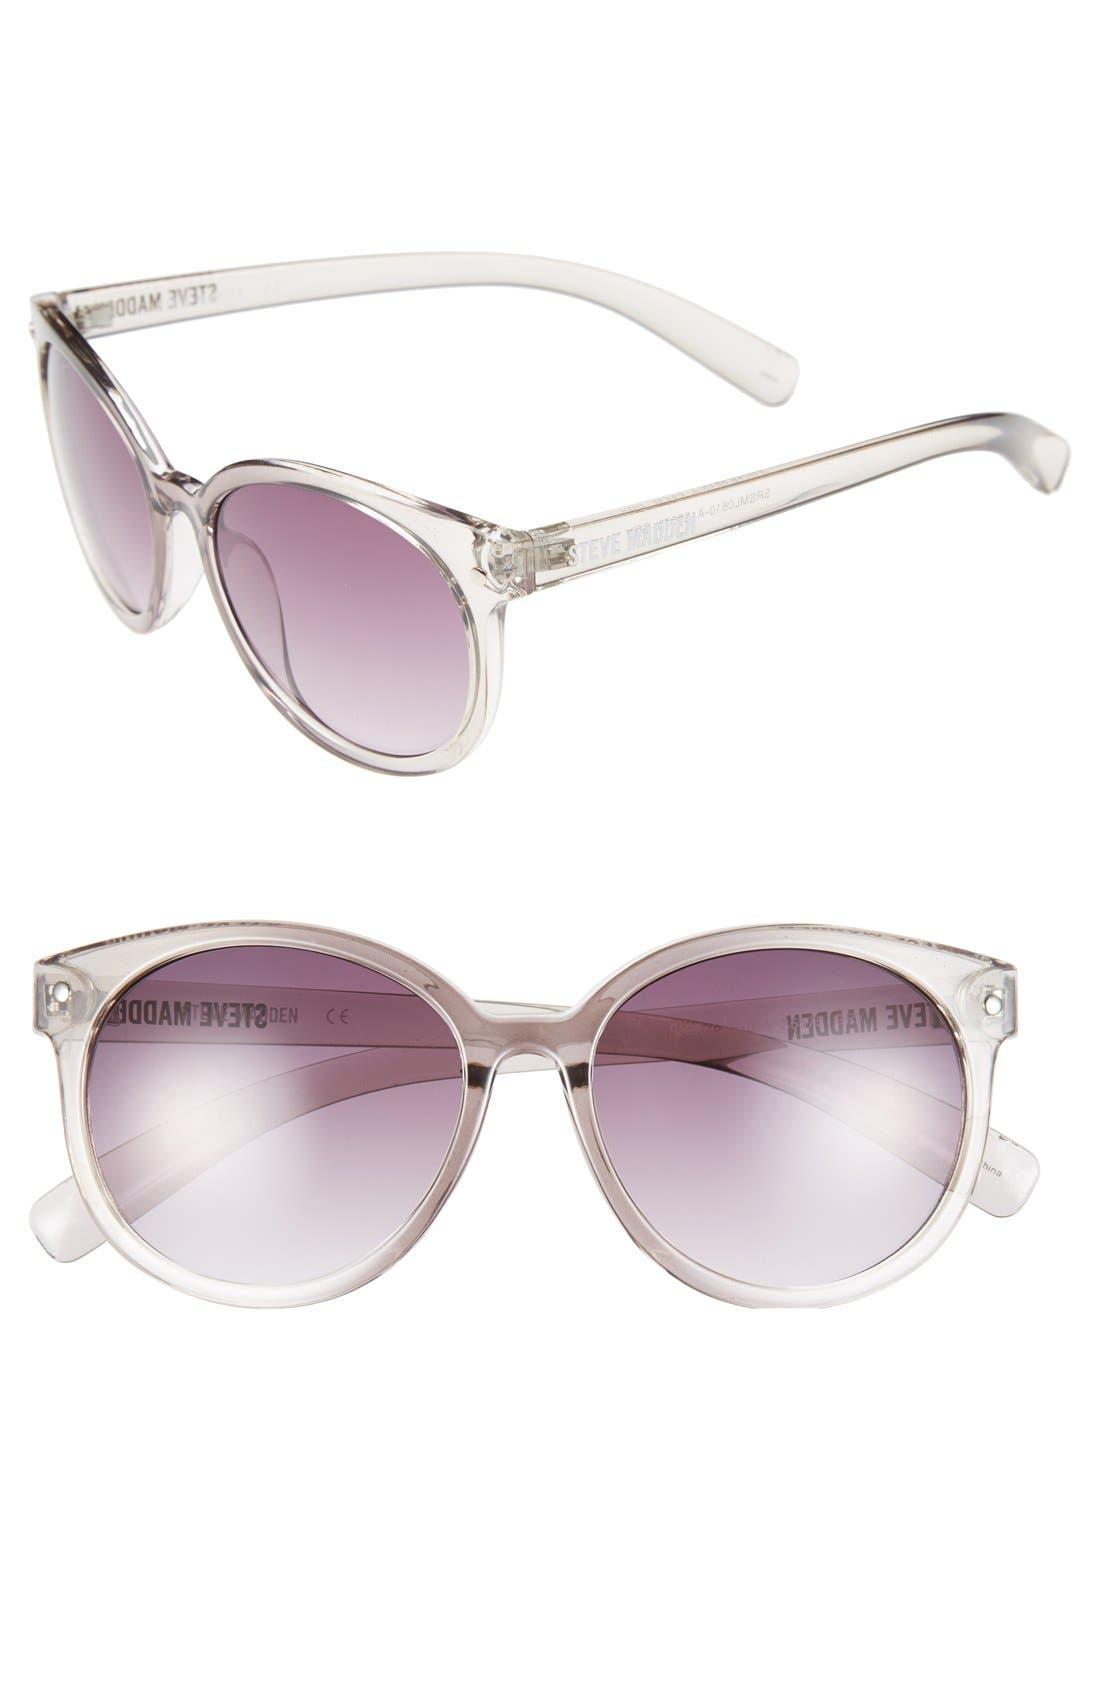 Main Image - Steve Madden 'Crystal' 54mm Oval Sunglasses